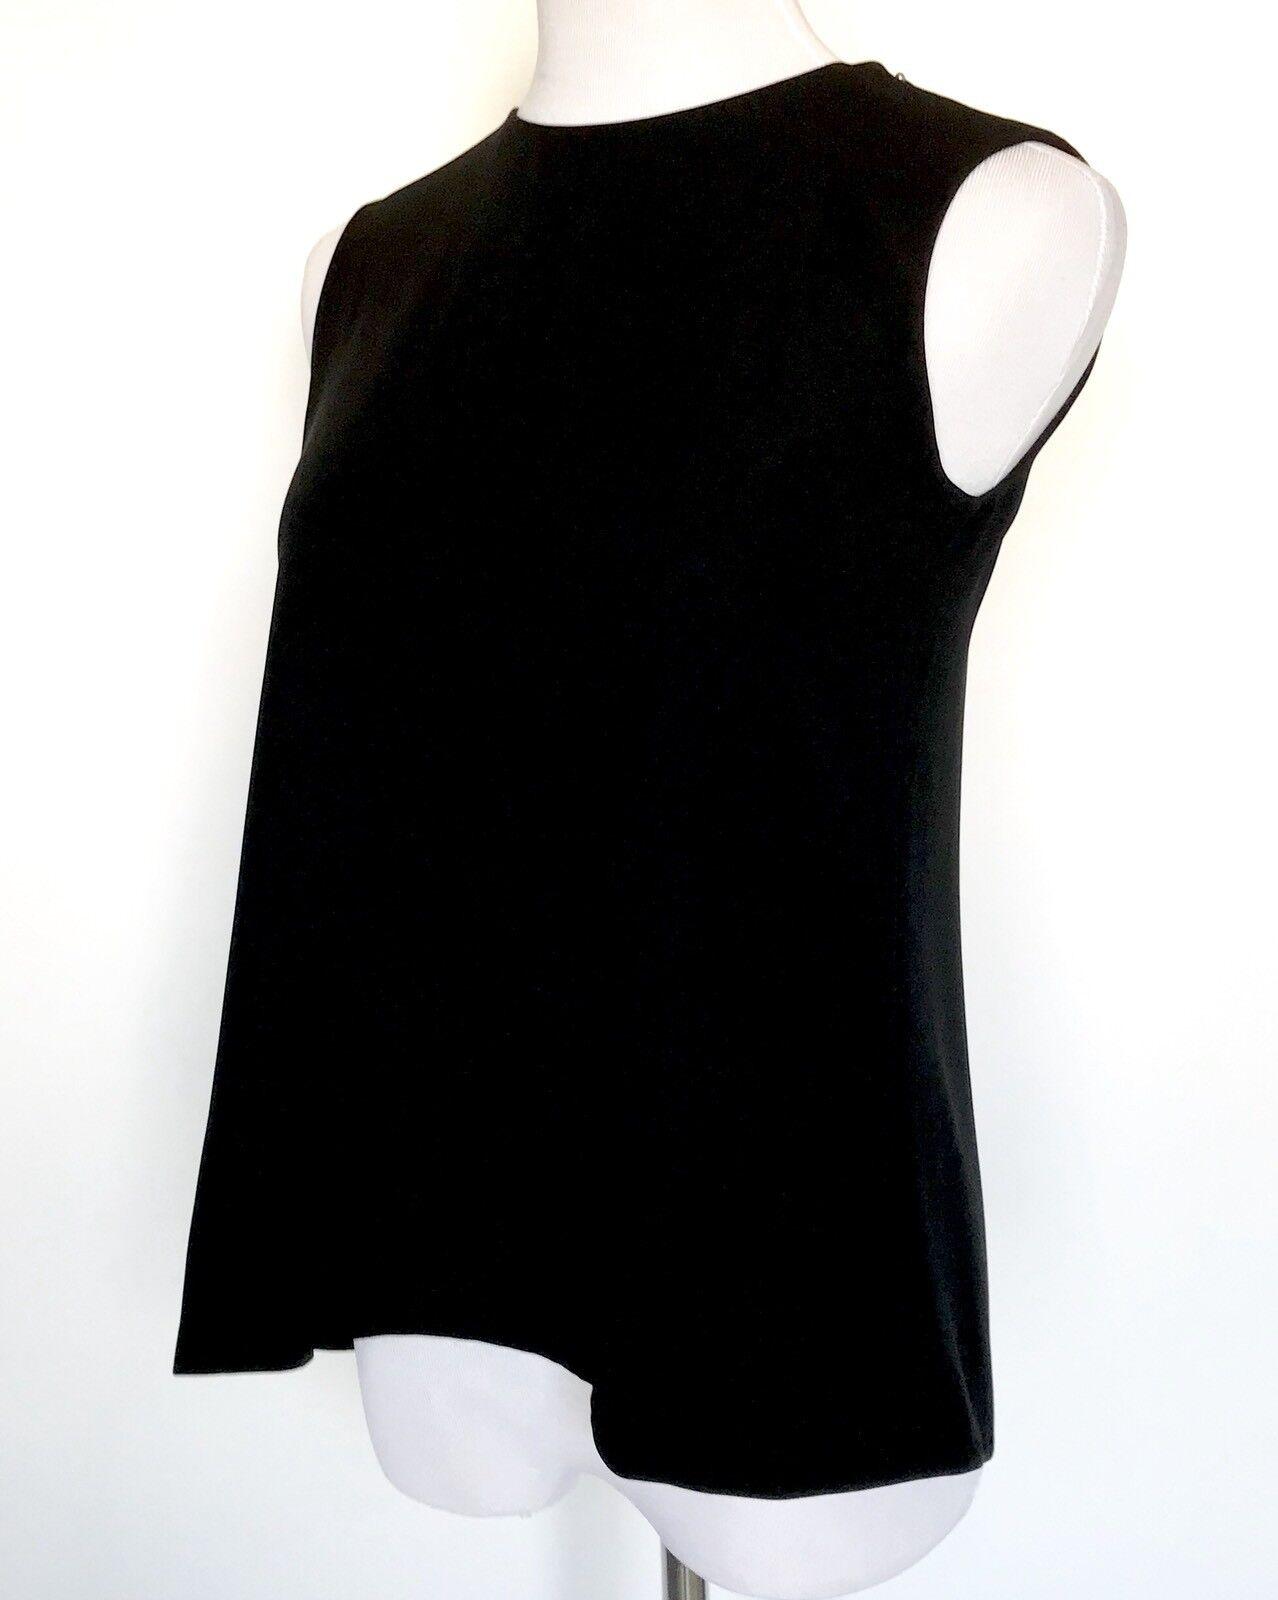 a5b89f90ff0317 Carolina Herrera schwarz Lace Panel Swing Top. NWT Retail Größe 4 Price  npkray538-Blusen,Tops & Shirts